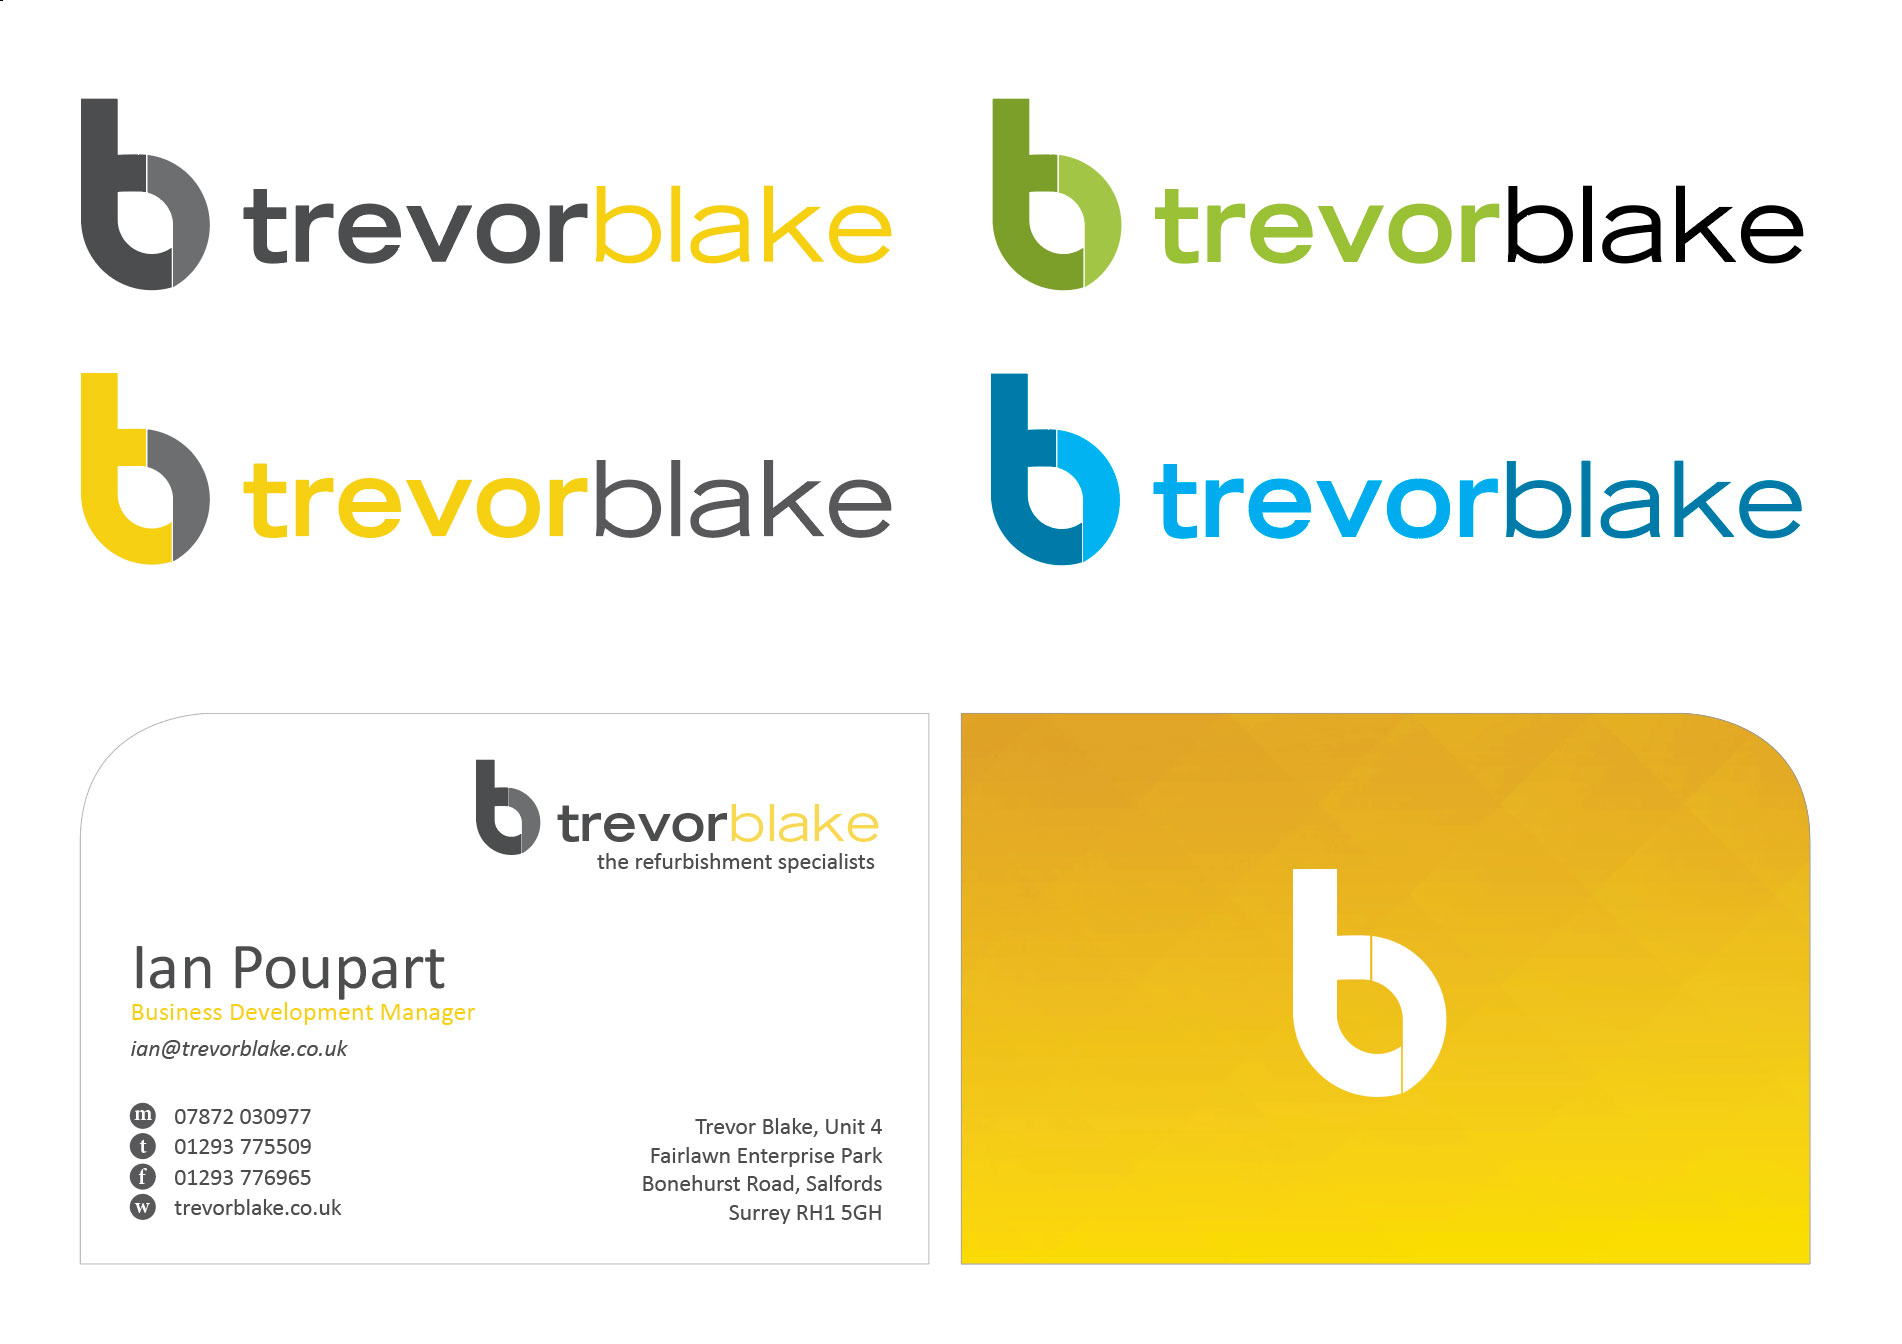 Trevor Blake rebrand